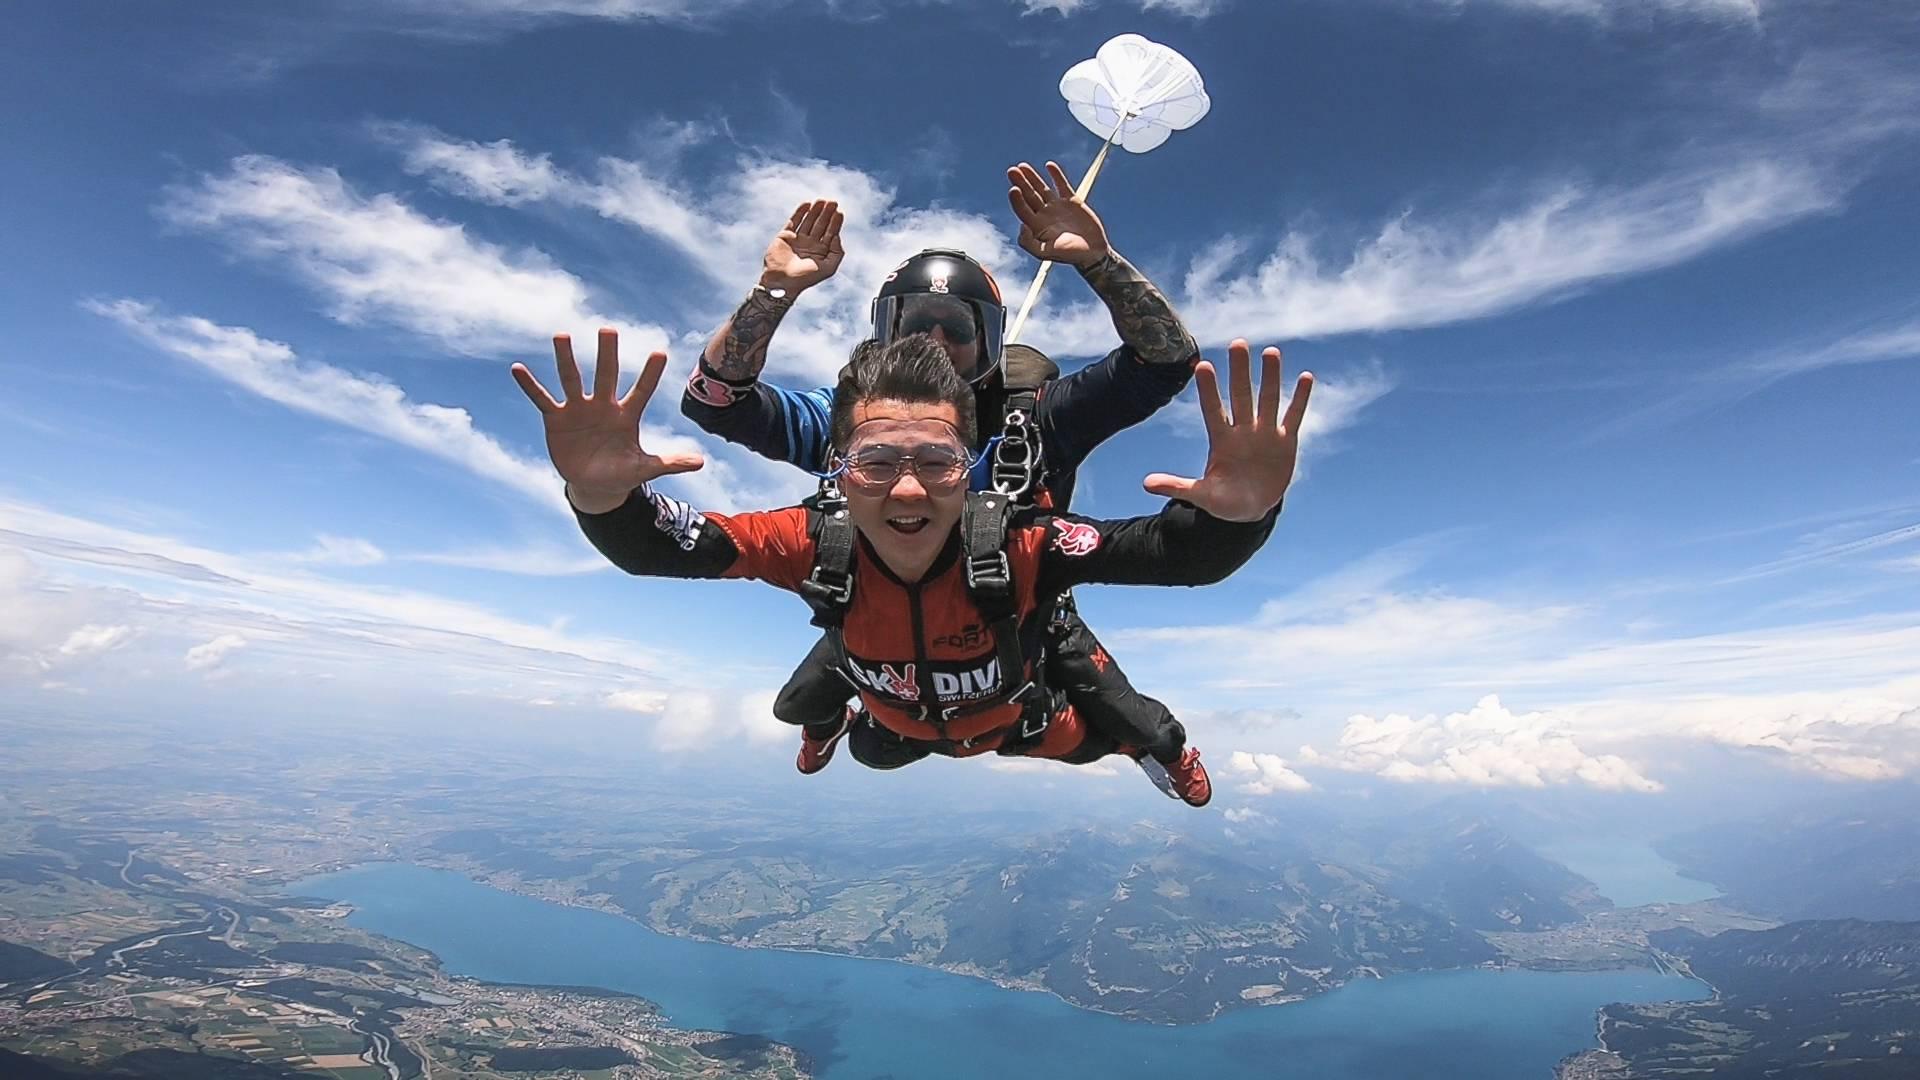 Airplane Skydiving - Outdoor Interlaken